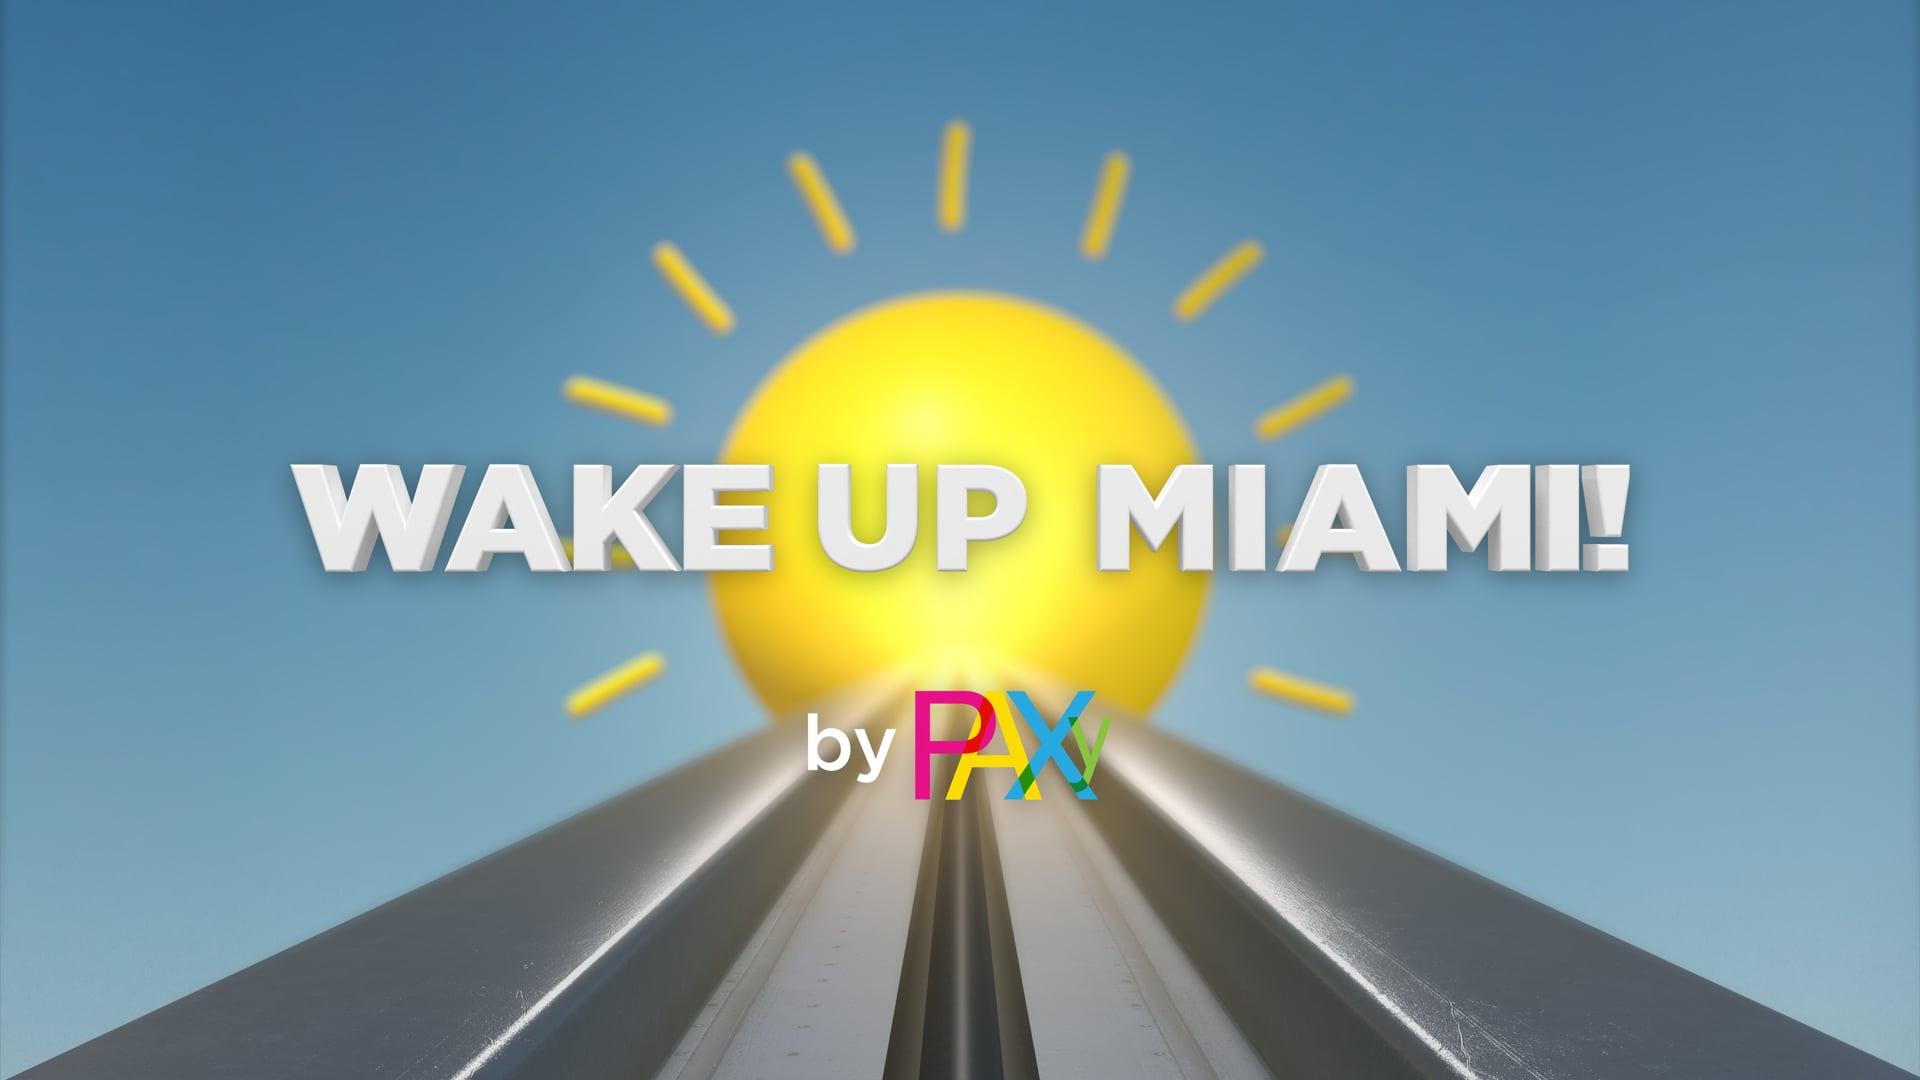 Wake up Miami!